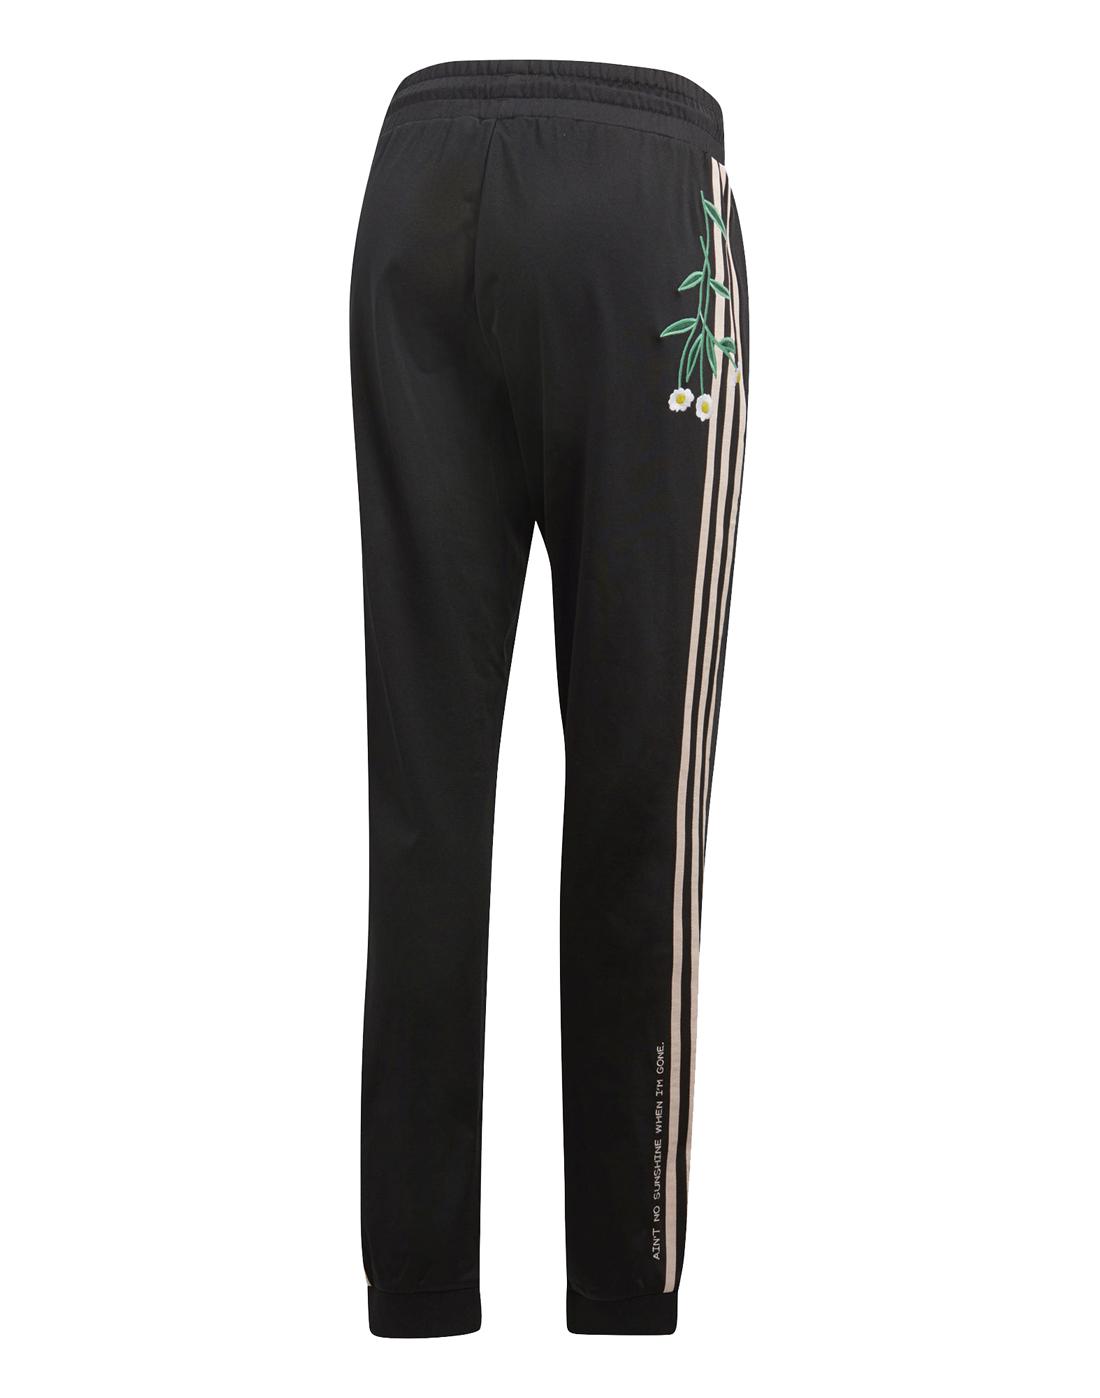 479e031ee1 Women's adidas Originals Love Set Track Pants   Life Style Sports